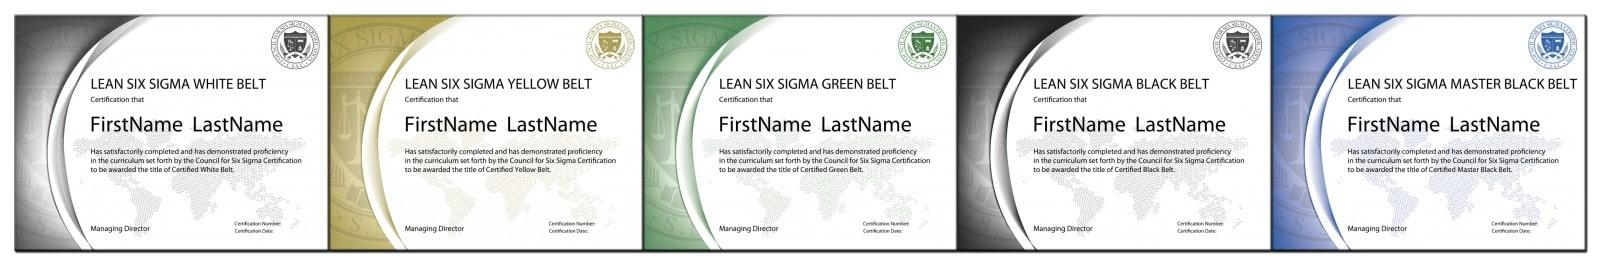 free lean six sigma green belt certification